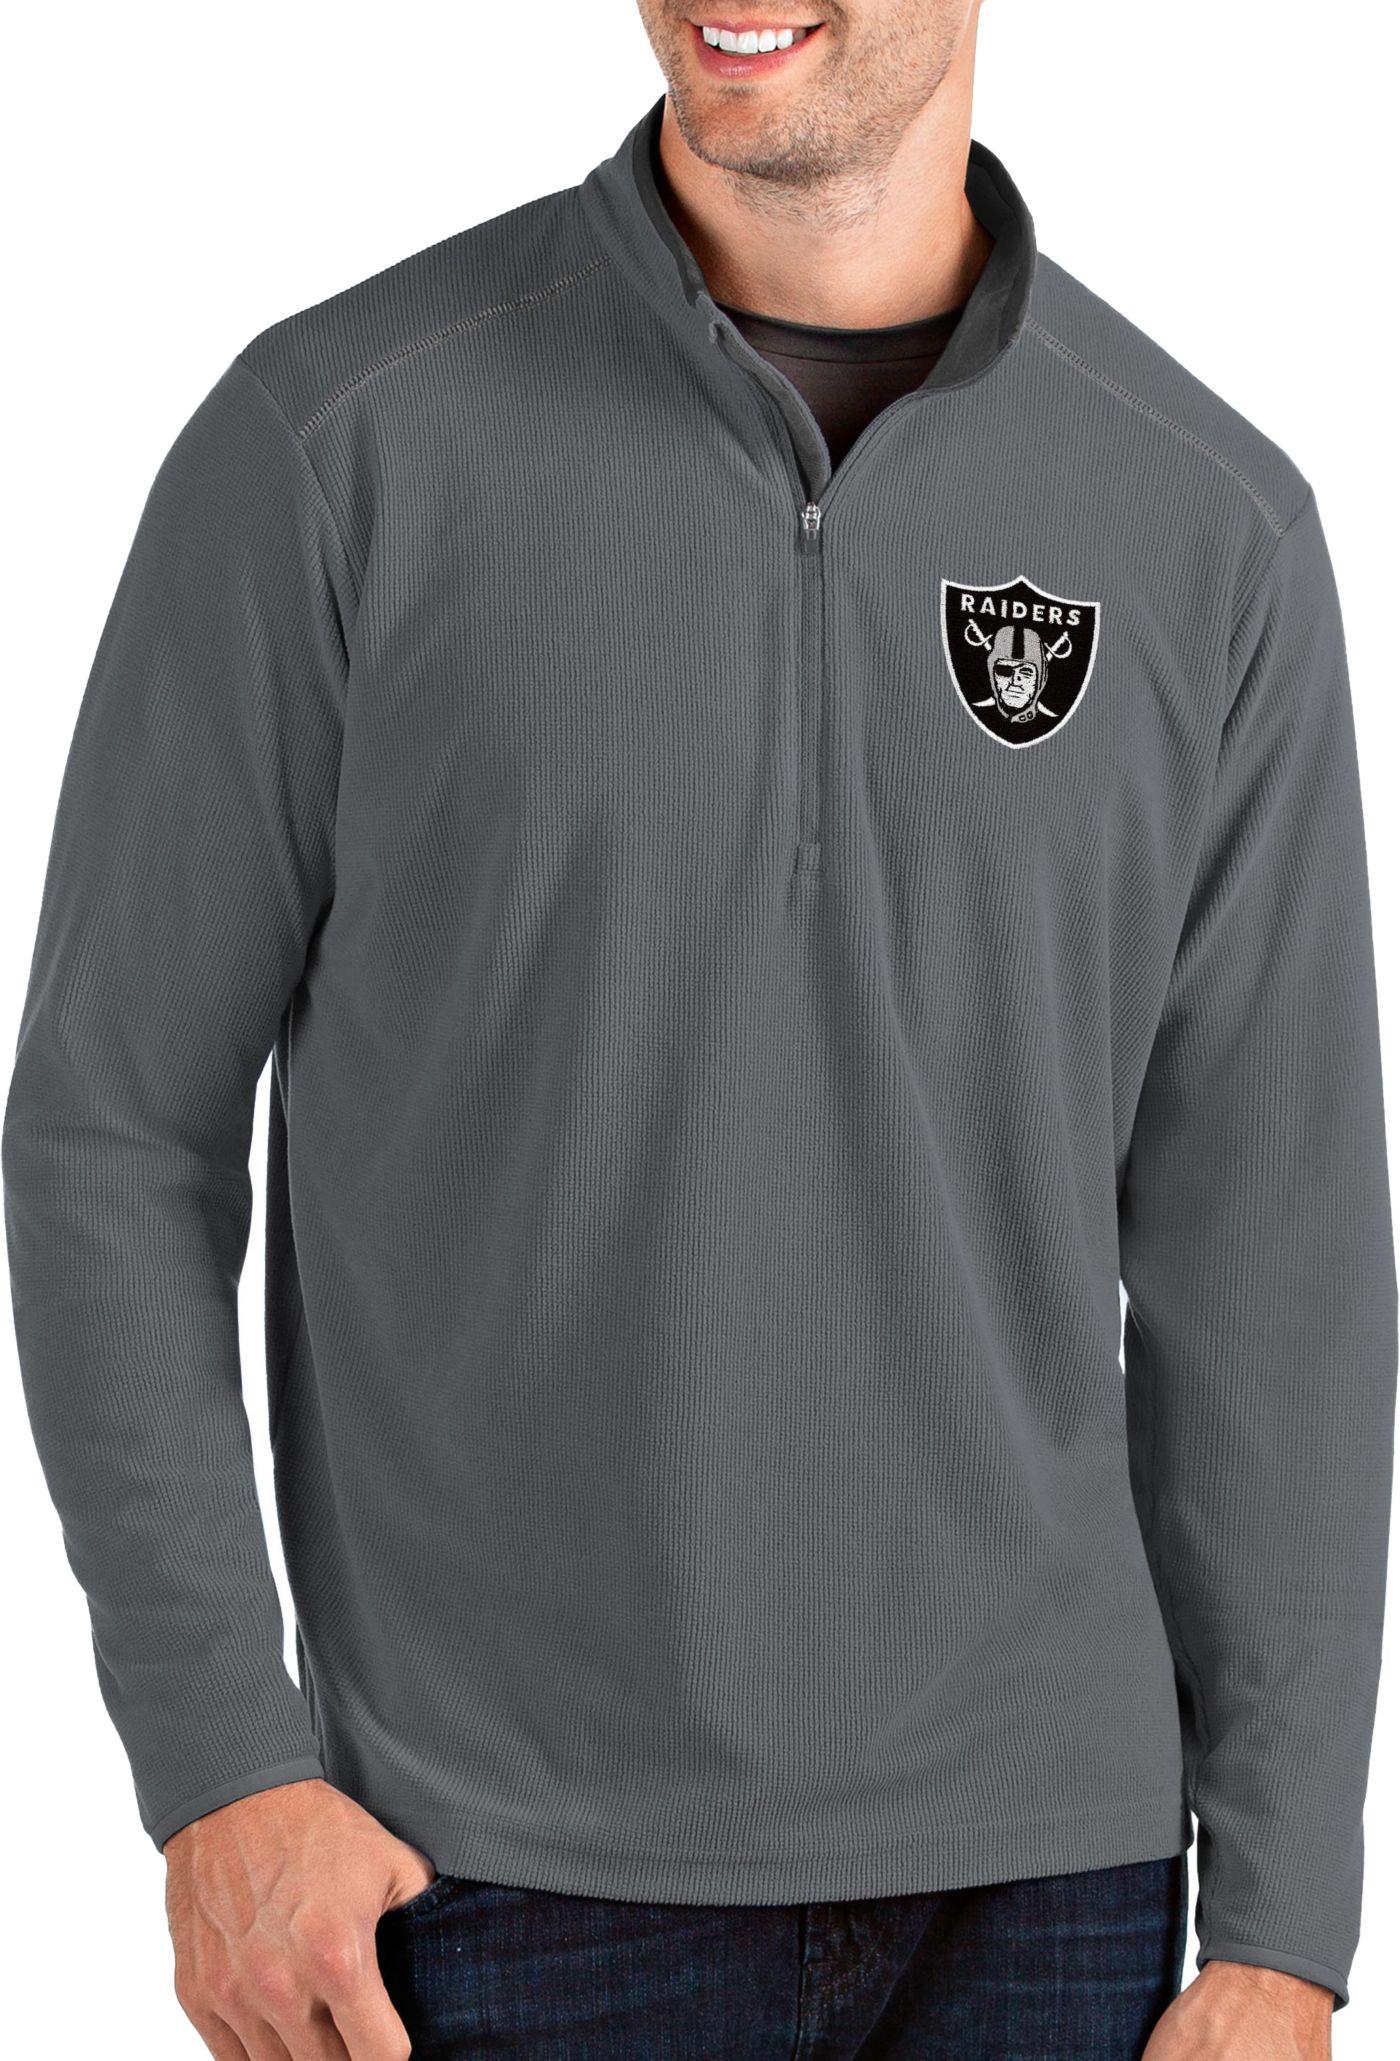 Antigua Men's Oakland Raiders Glacier Grey Quarter-Zip Pullover